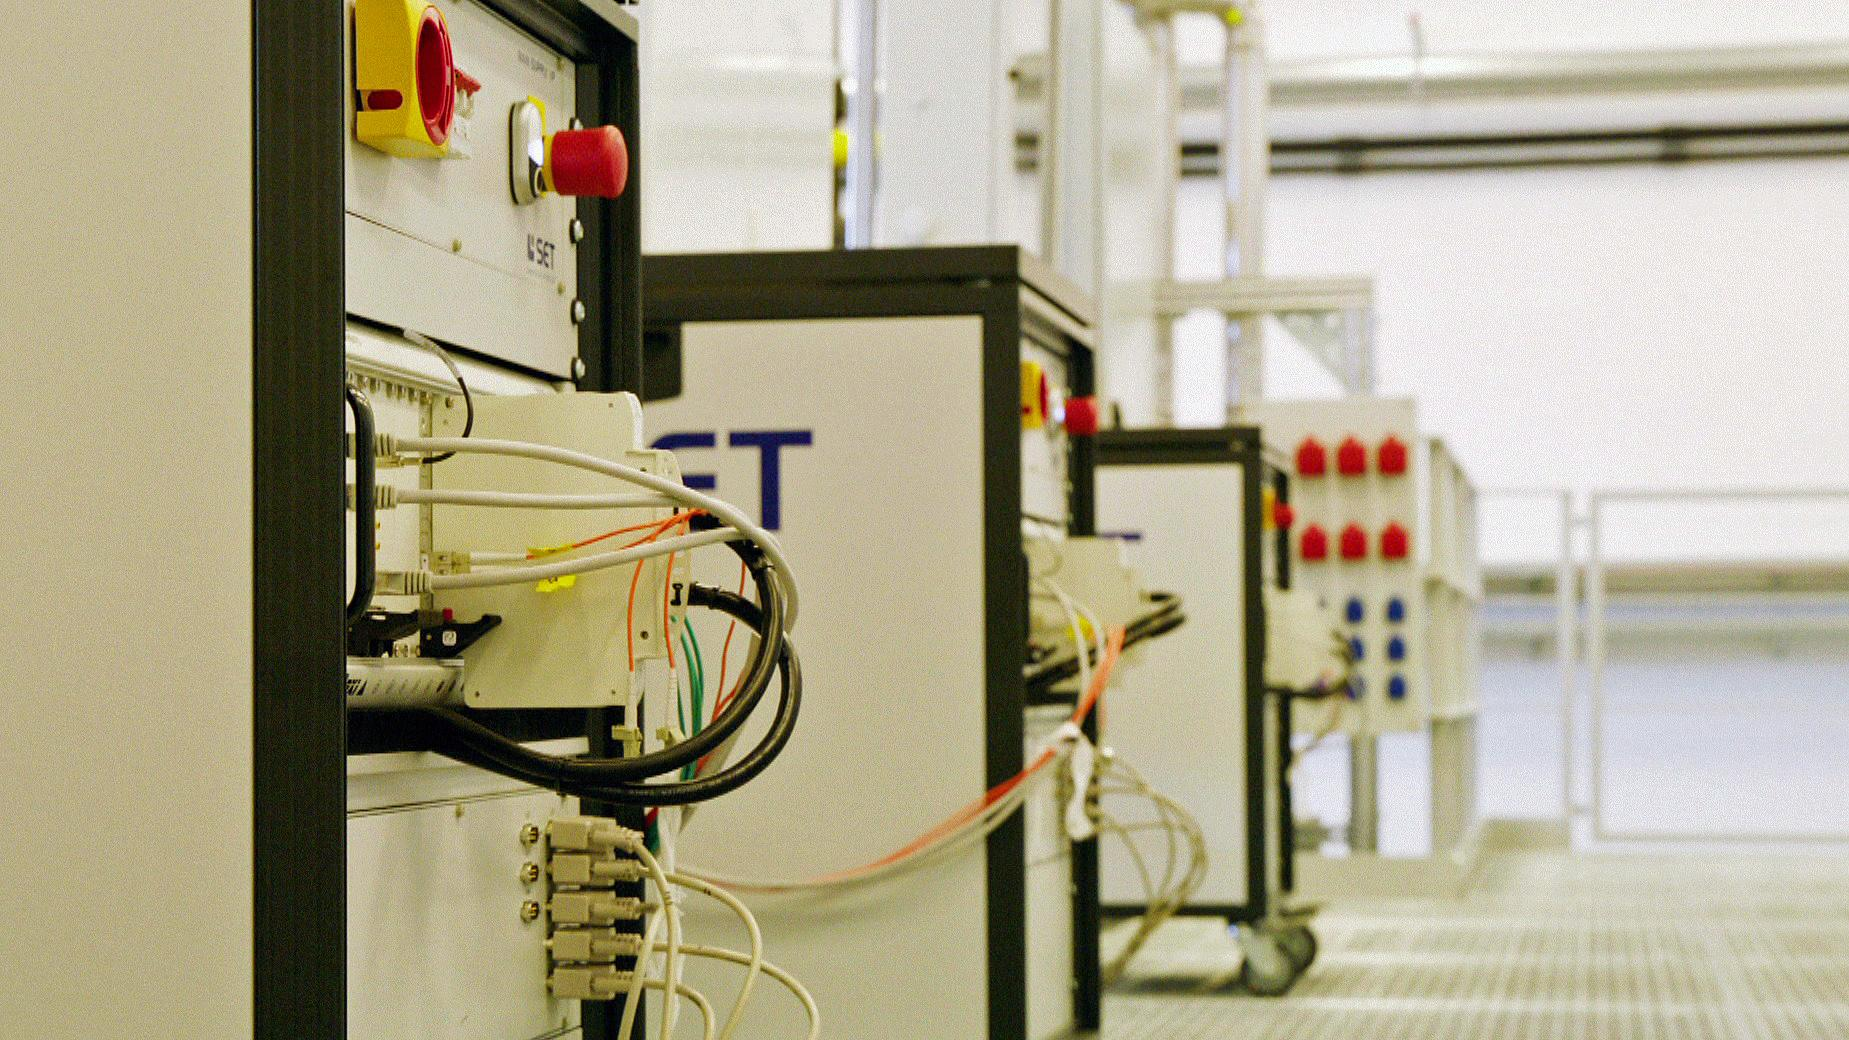 Microgrid-Testanlage